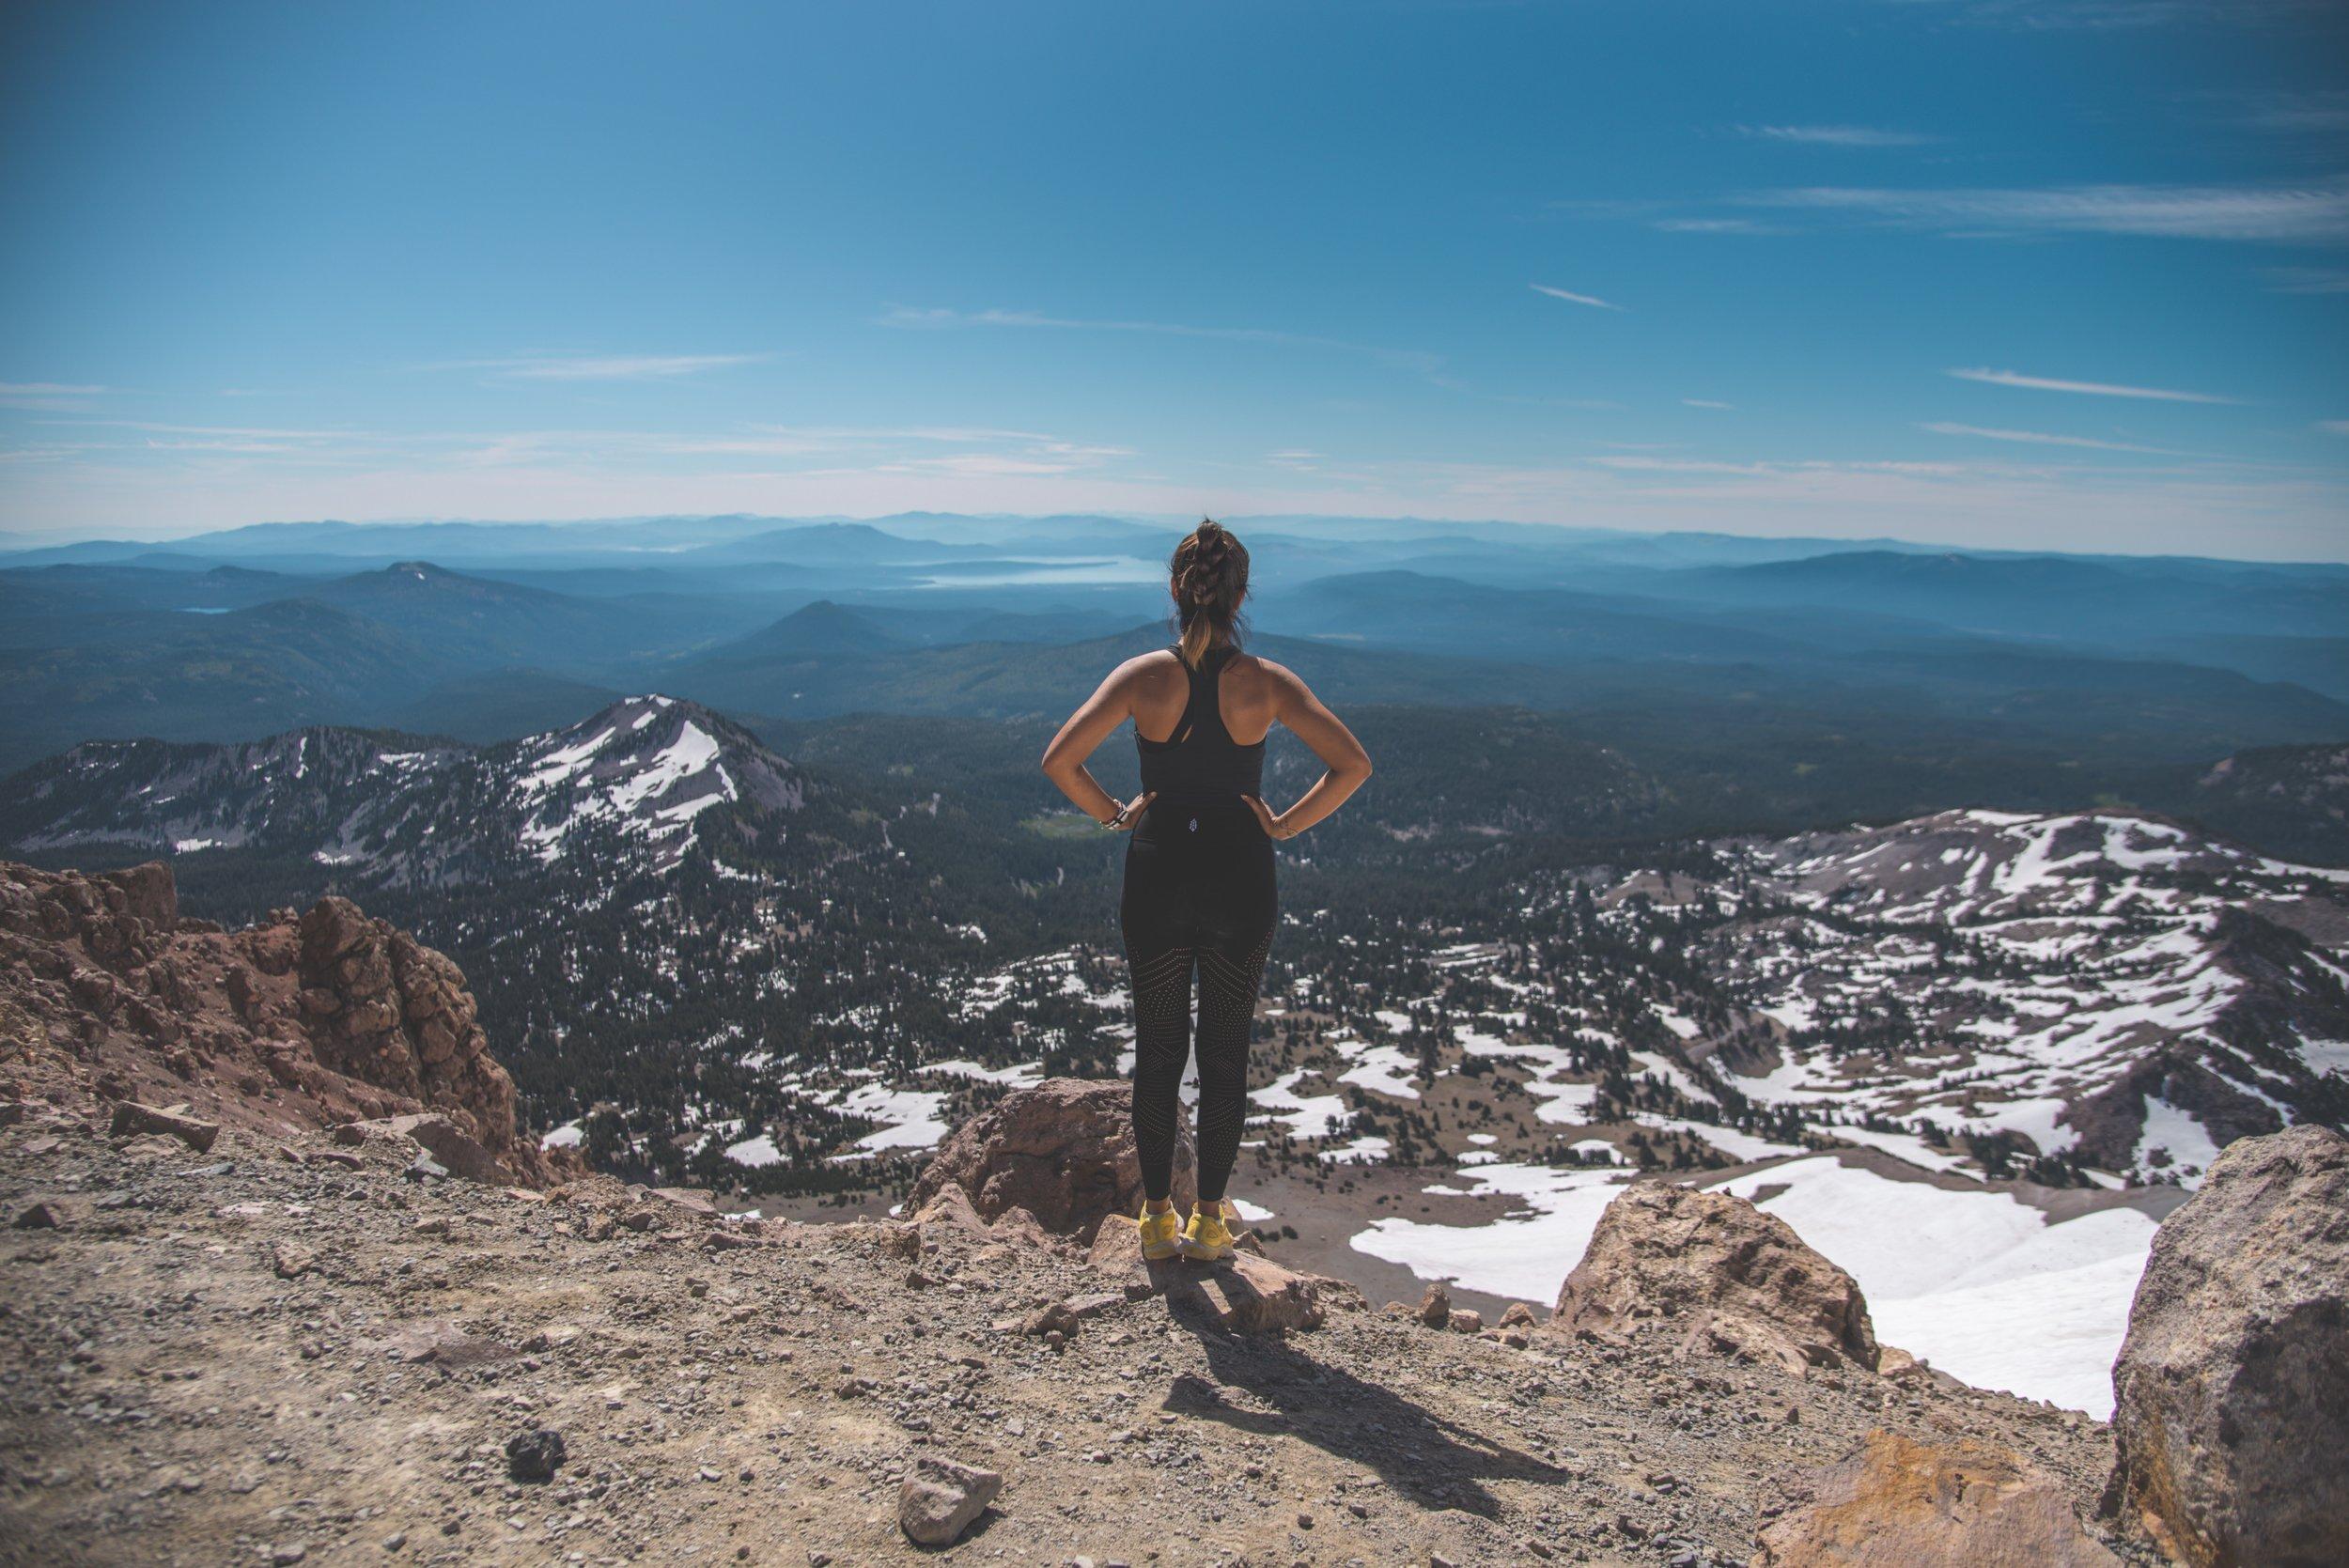 Vista desde la punta de la montaña Lassen - foto de Matt Davey.